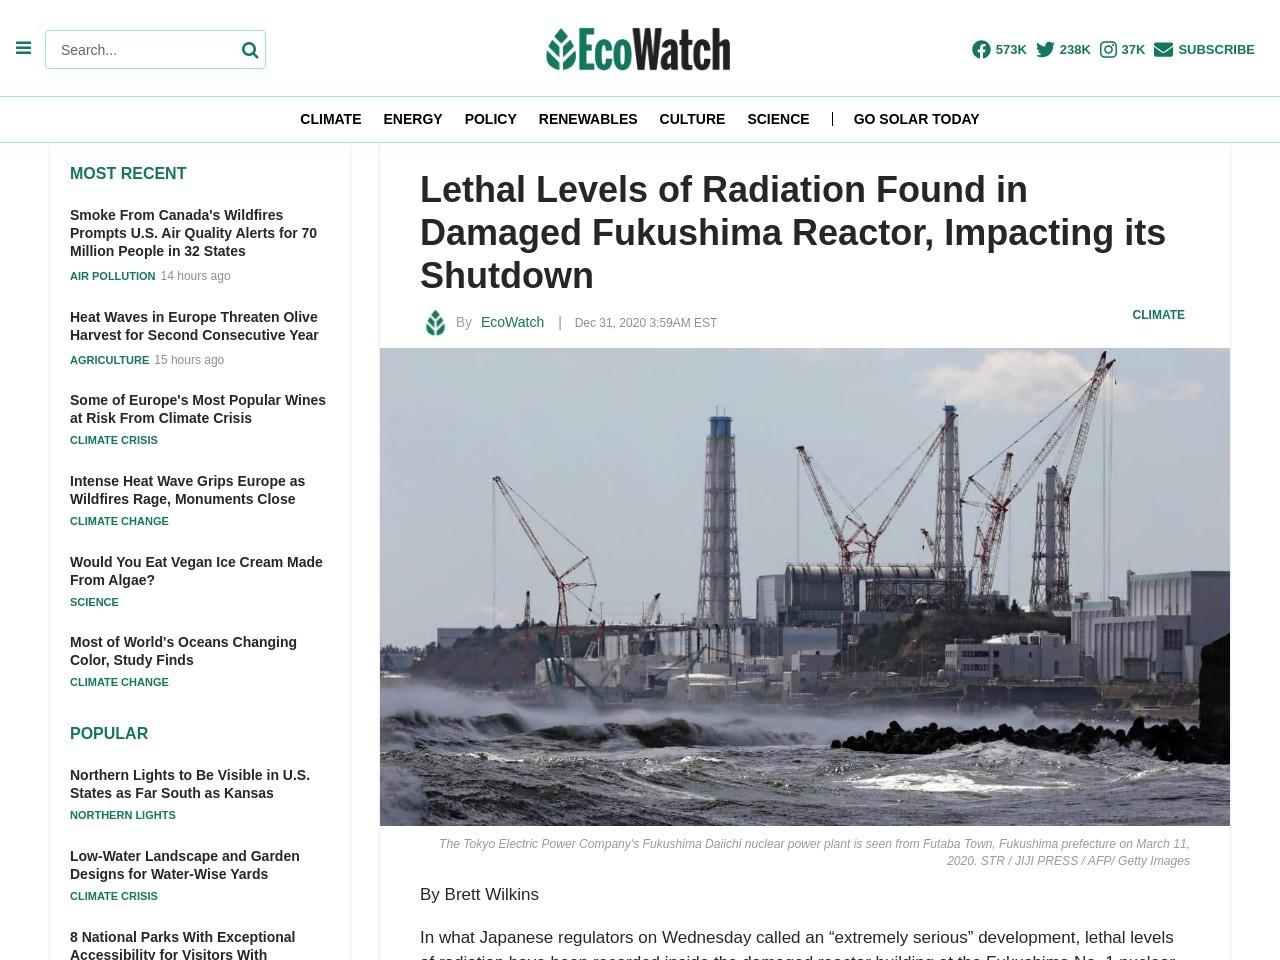 Lethal Levels of Radiation Found in Damaged Fukushima Reactor, Impacting its Shutdown – EcoWatch